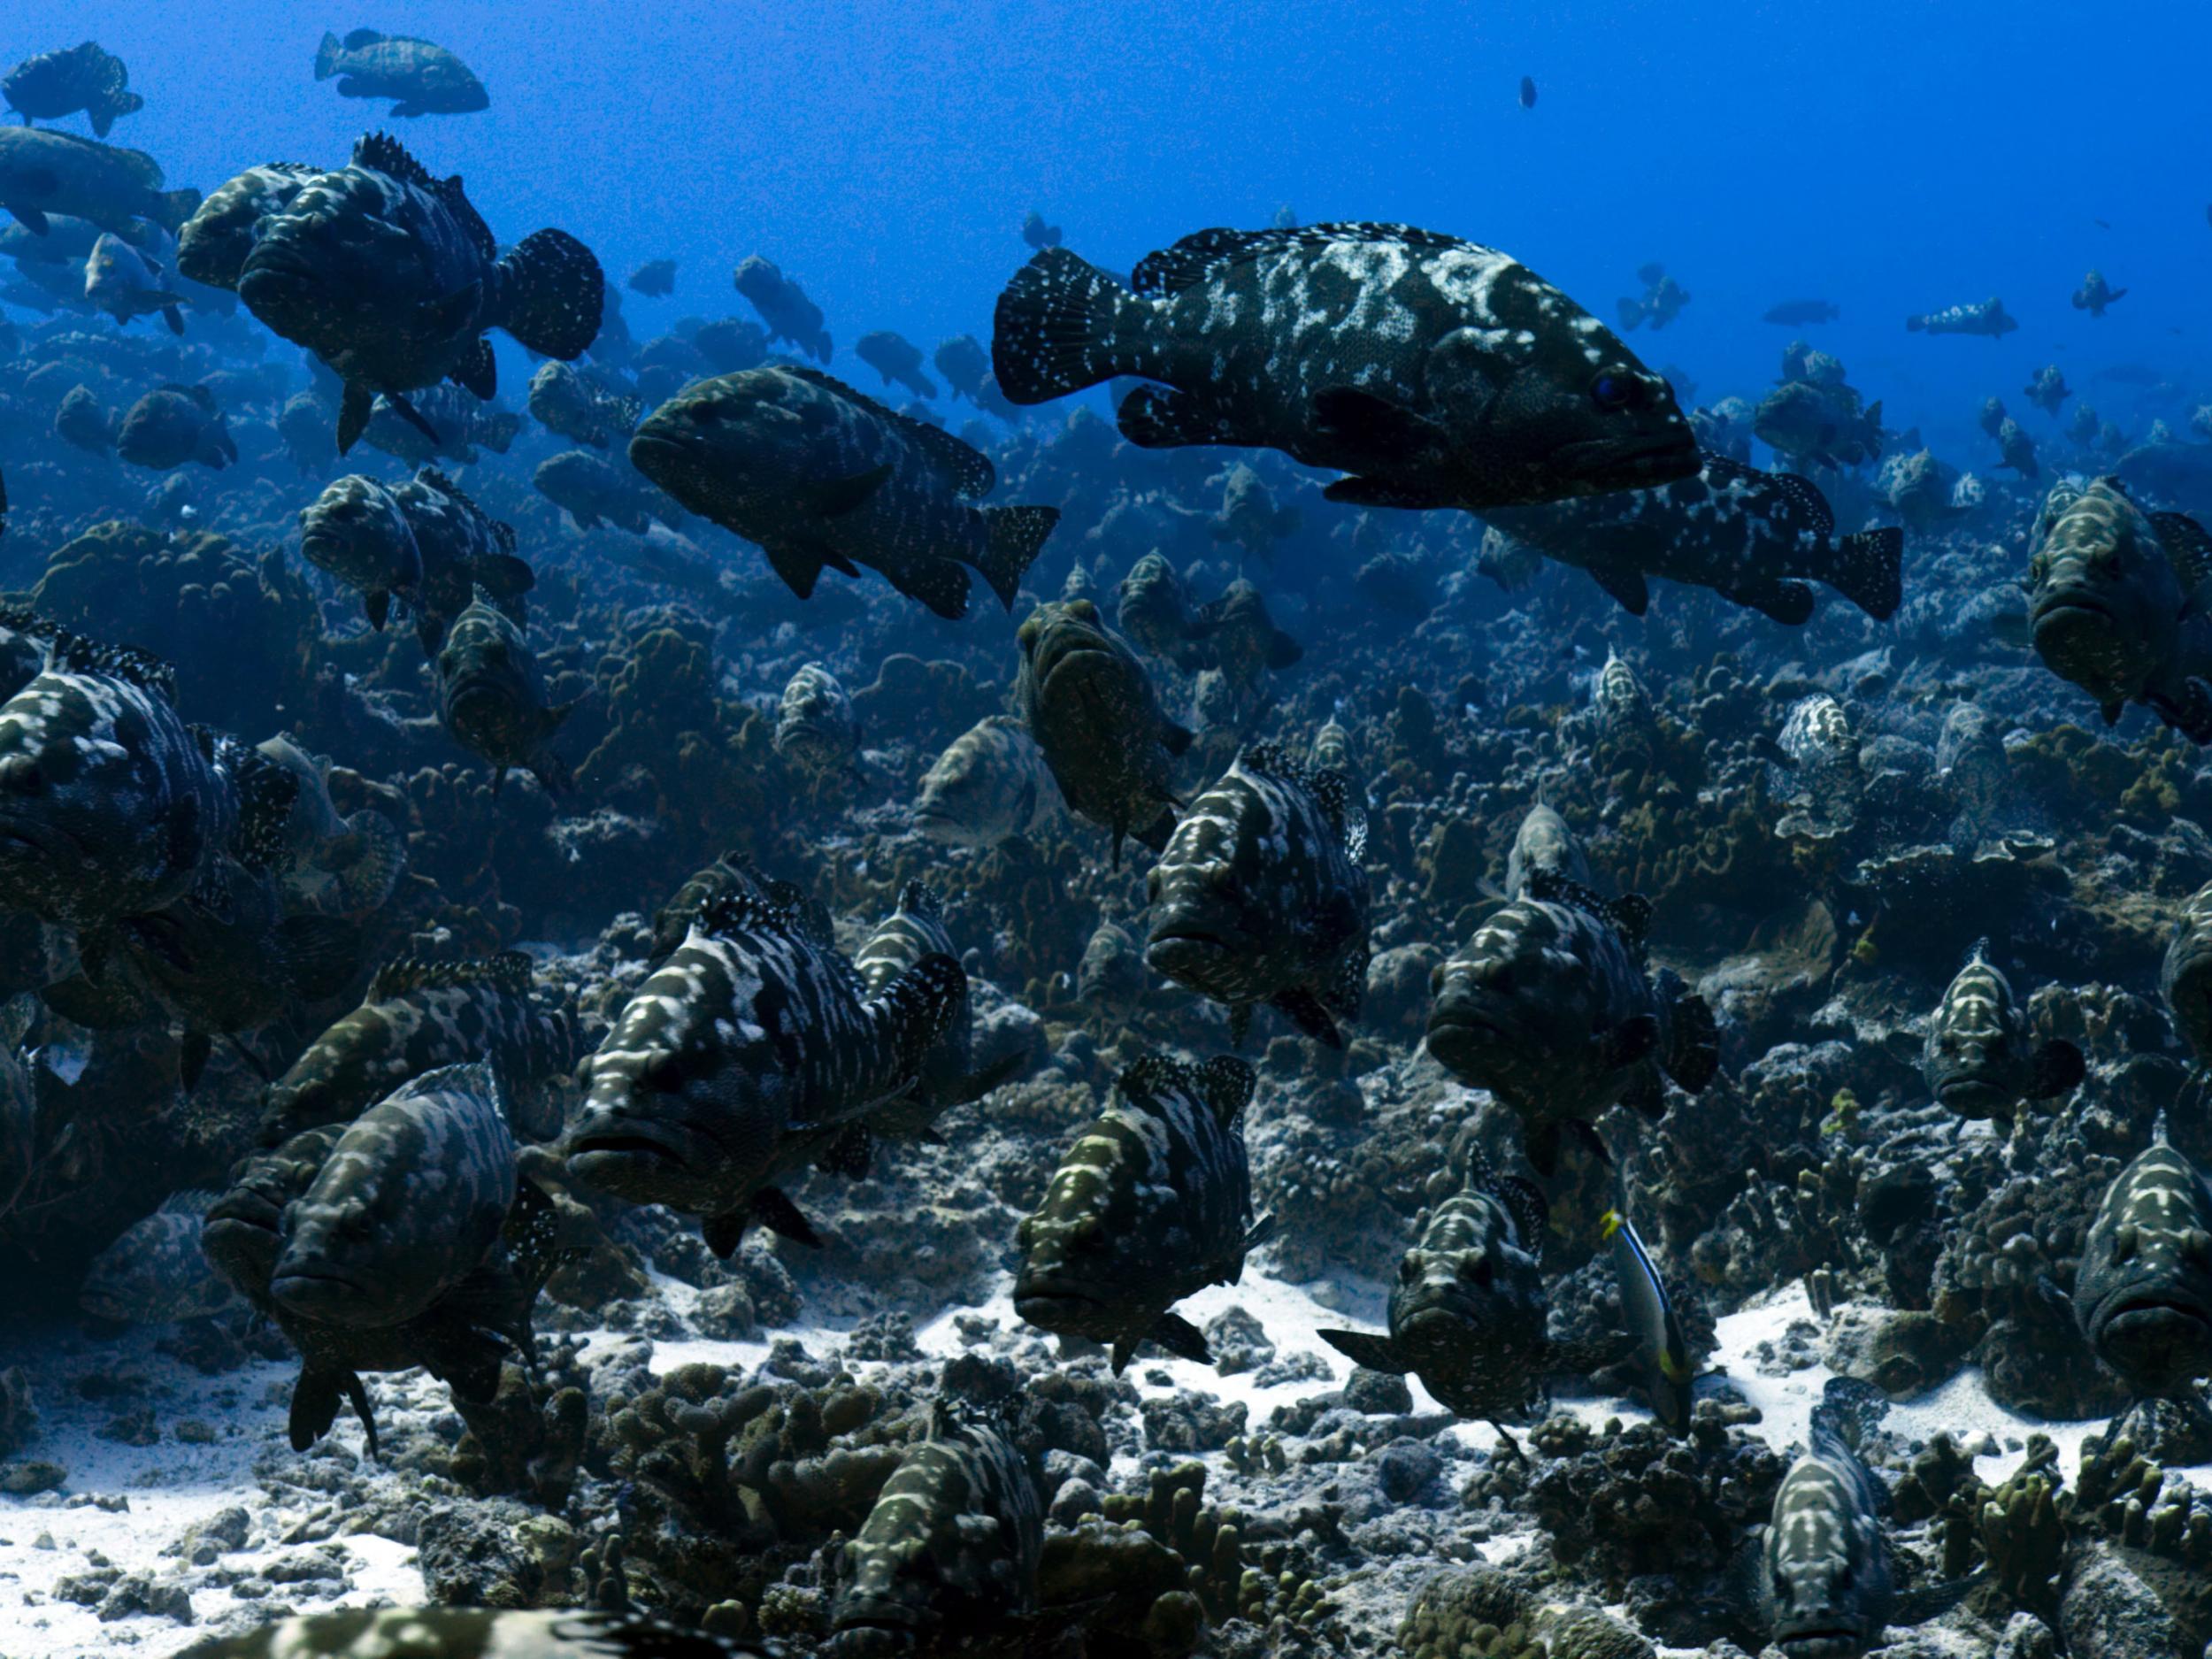 An aggregation of marbled grouper (Epinephelus polyphekadion), French Polynesia